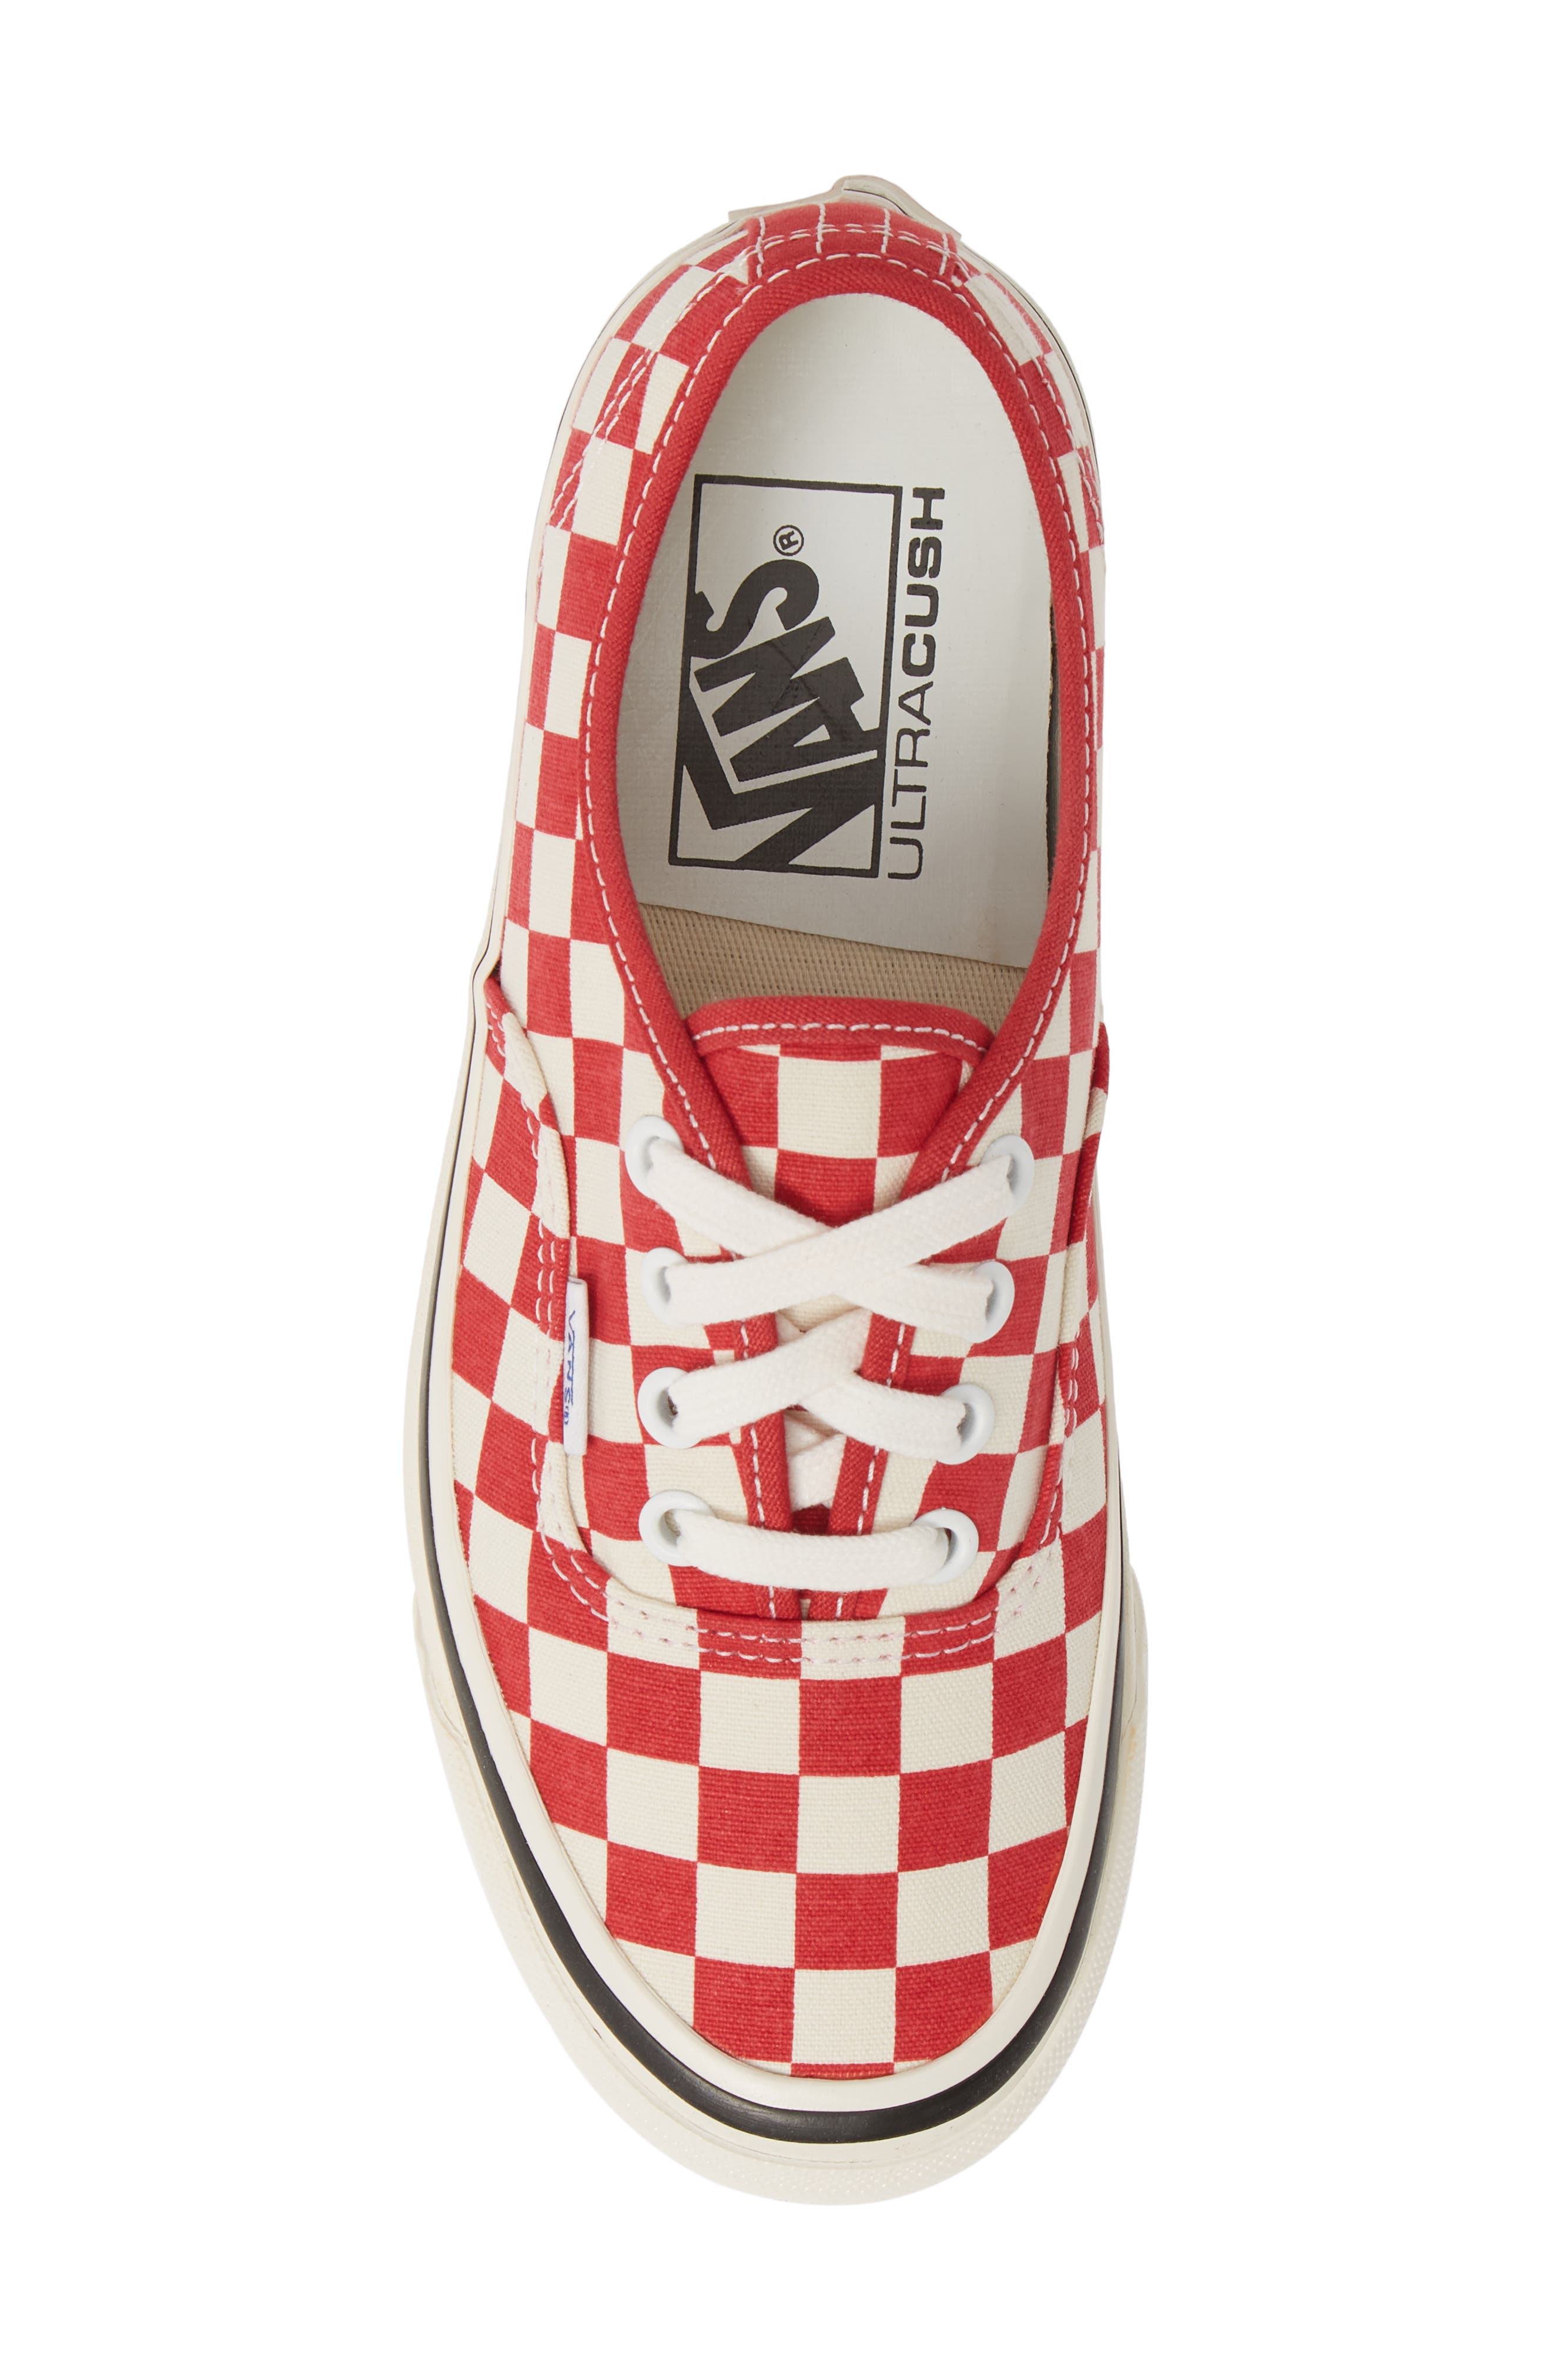 VANS, Authentic 44 DX Sneaker, Alternate thumbnail 5, color, RED/ CHECK